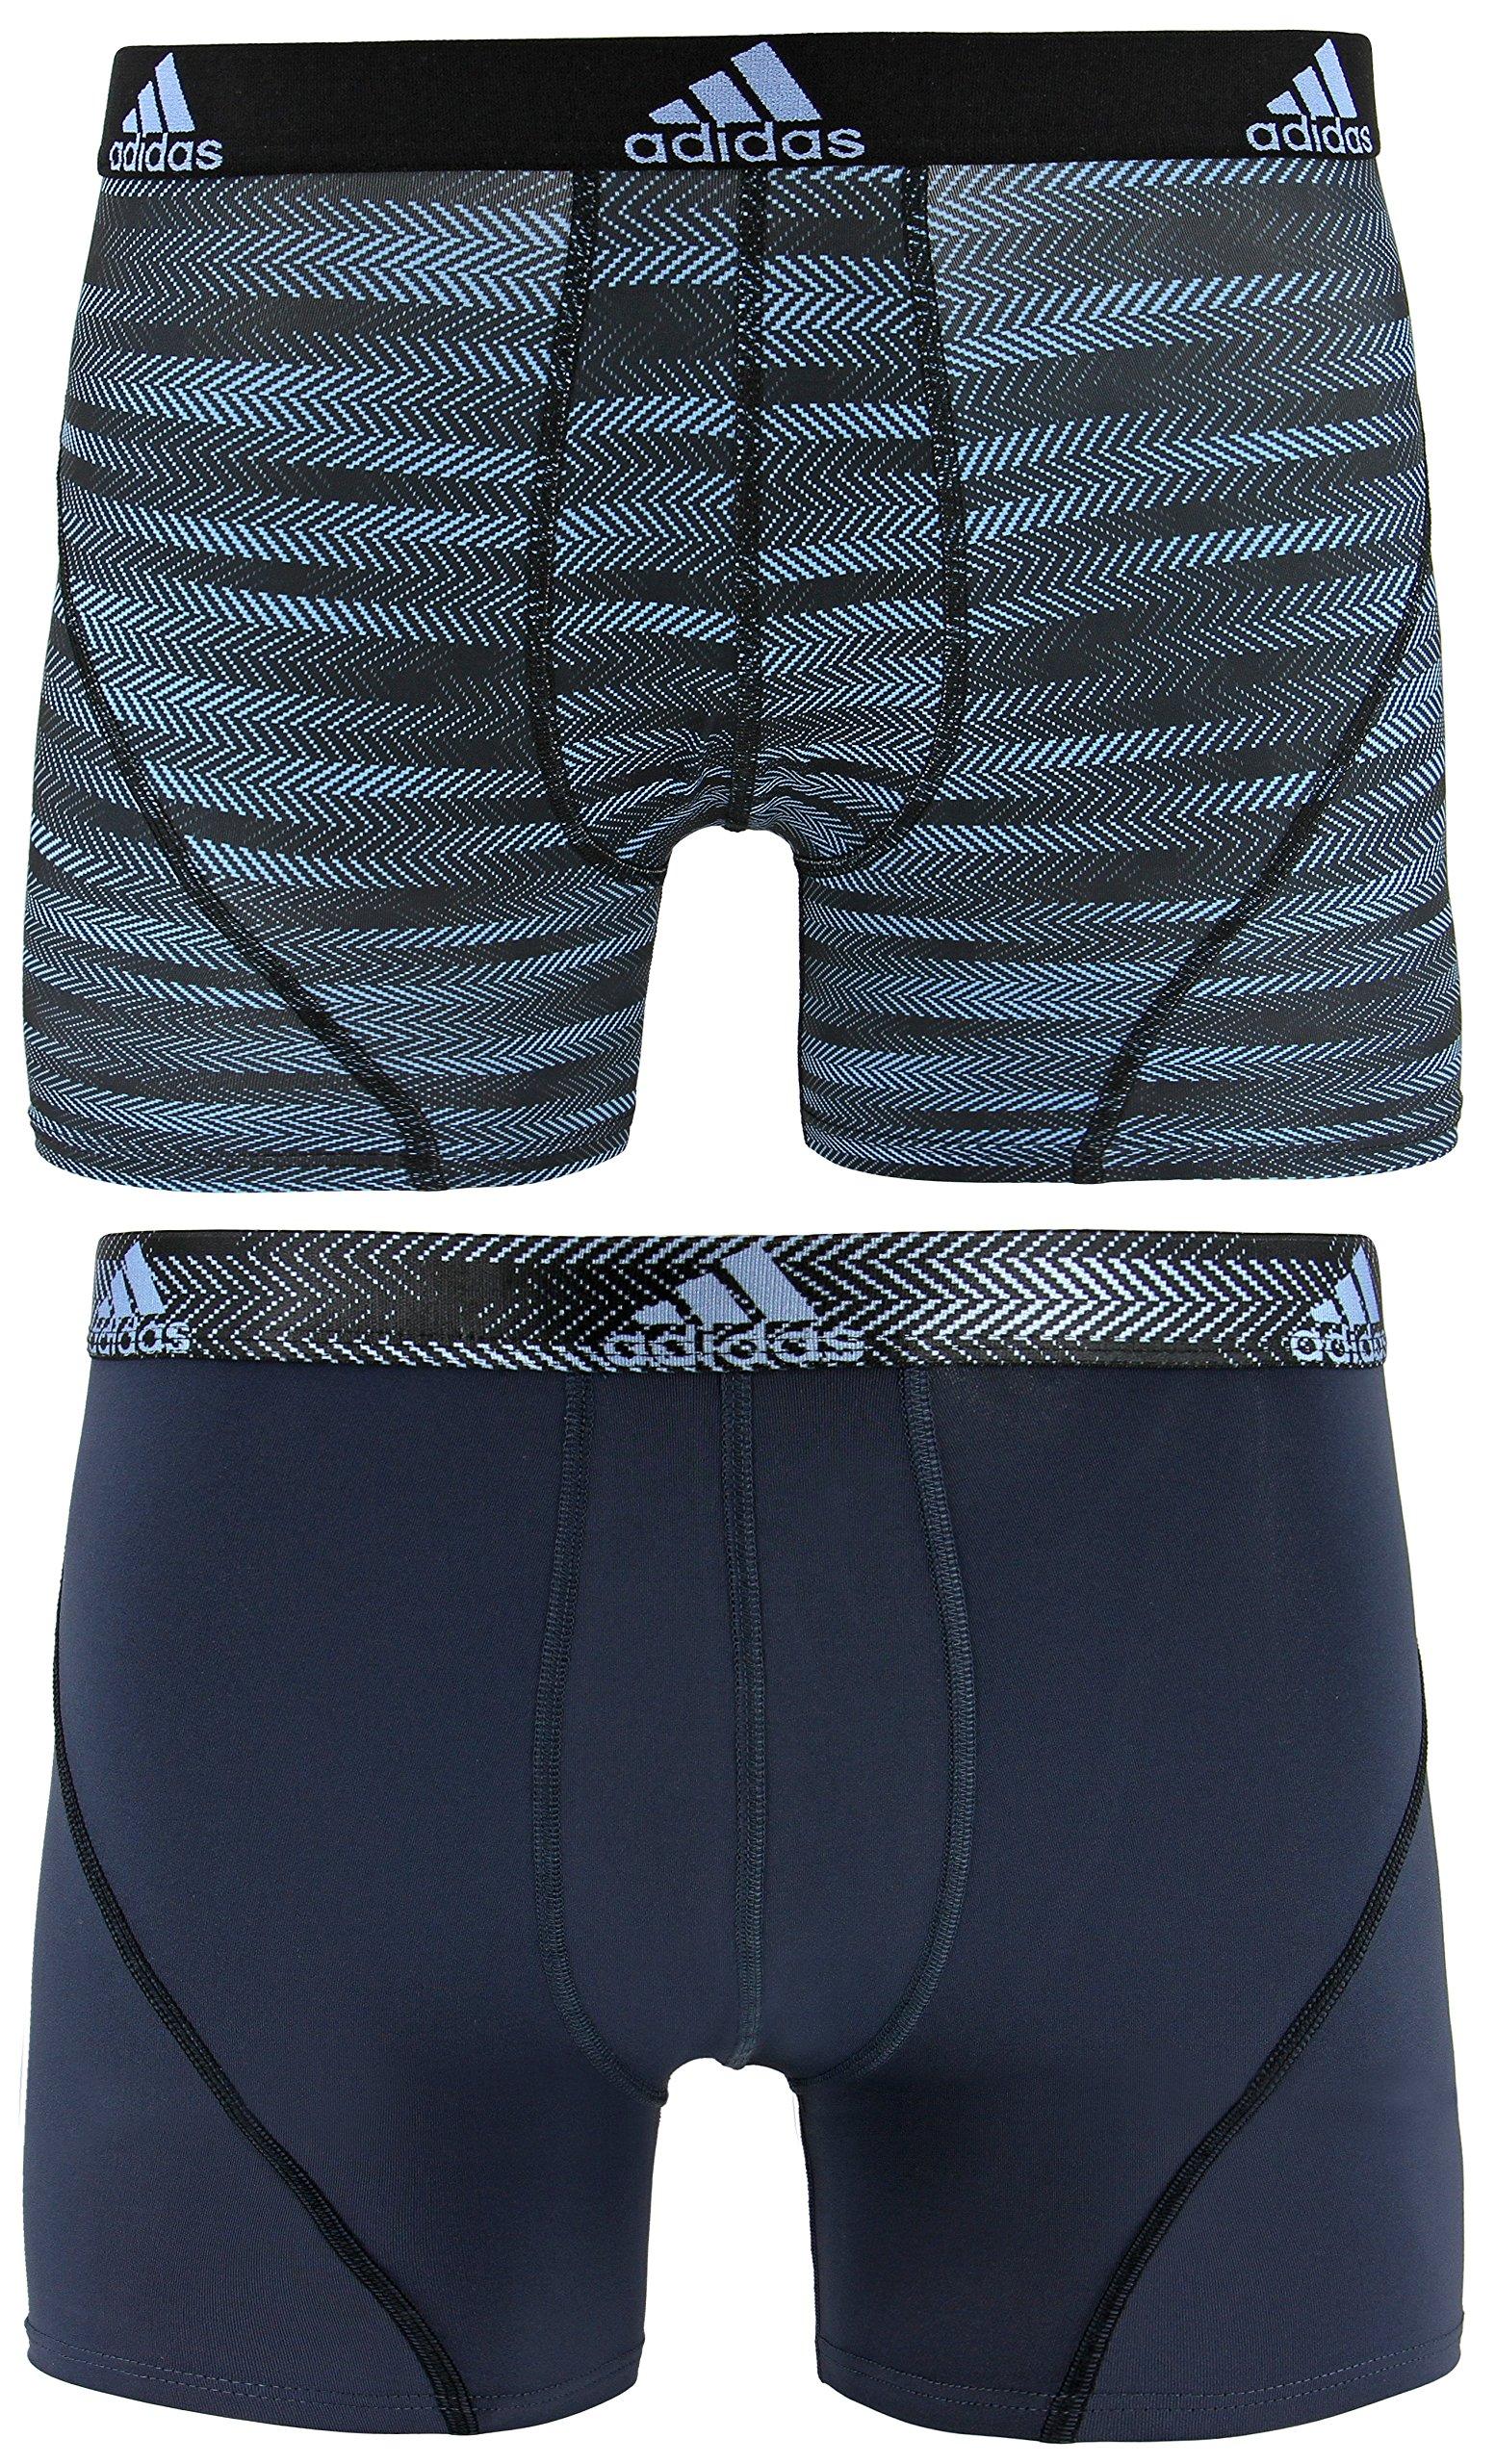 adidas Men's Sport Performance Trunk Underwear (2-Pack), Collegiate Light Blue Ratio Urban Sky Ratio, MEDIUM by adidas